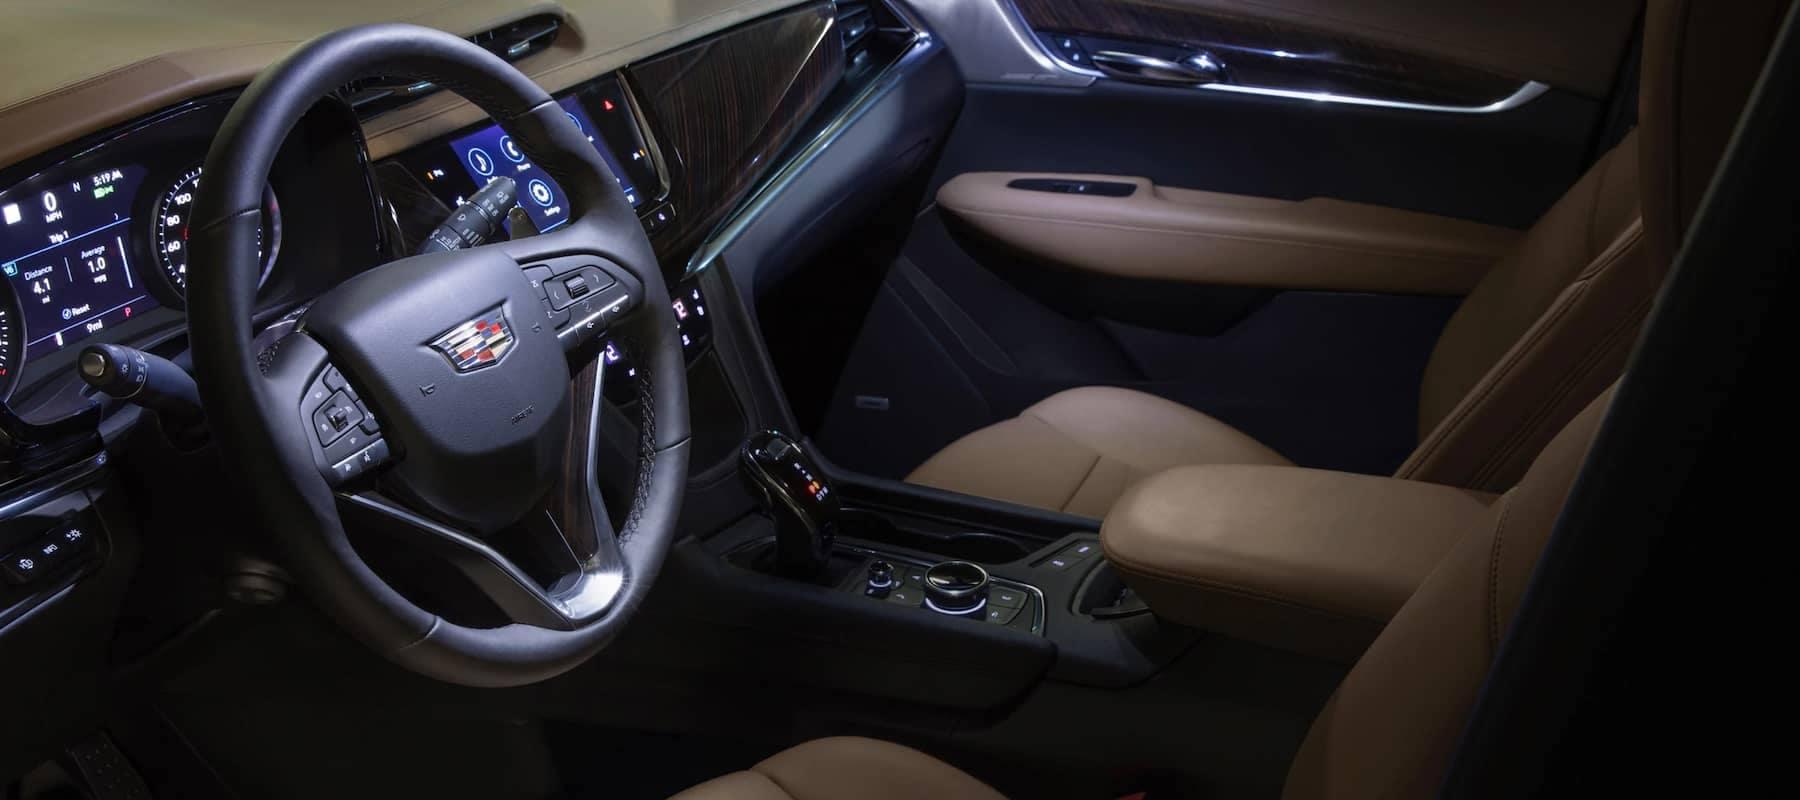 interior shot of Cadillac front seat